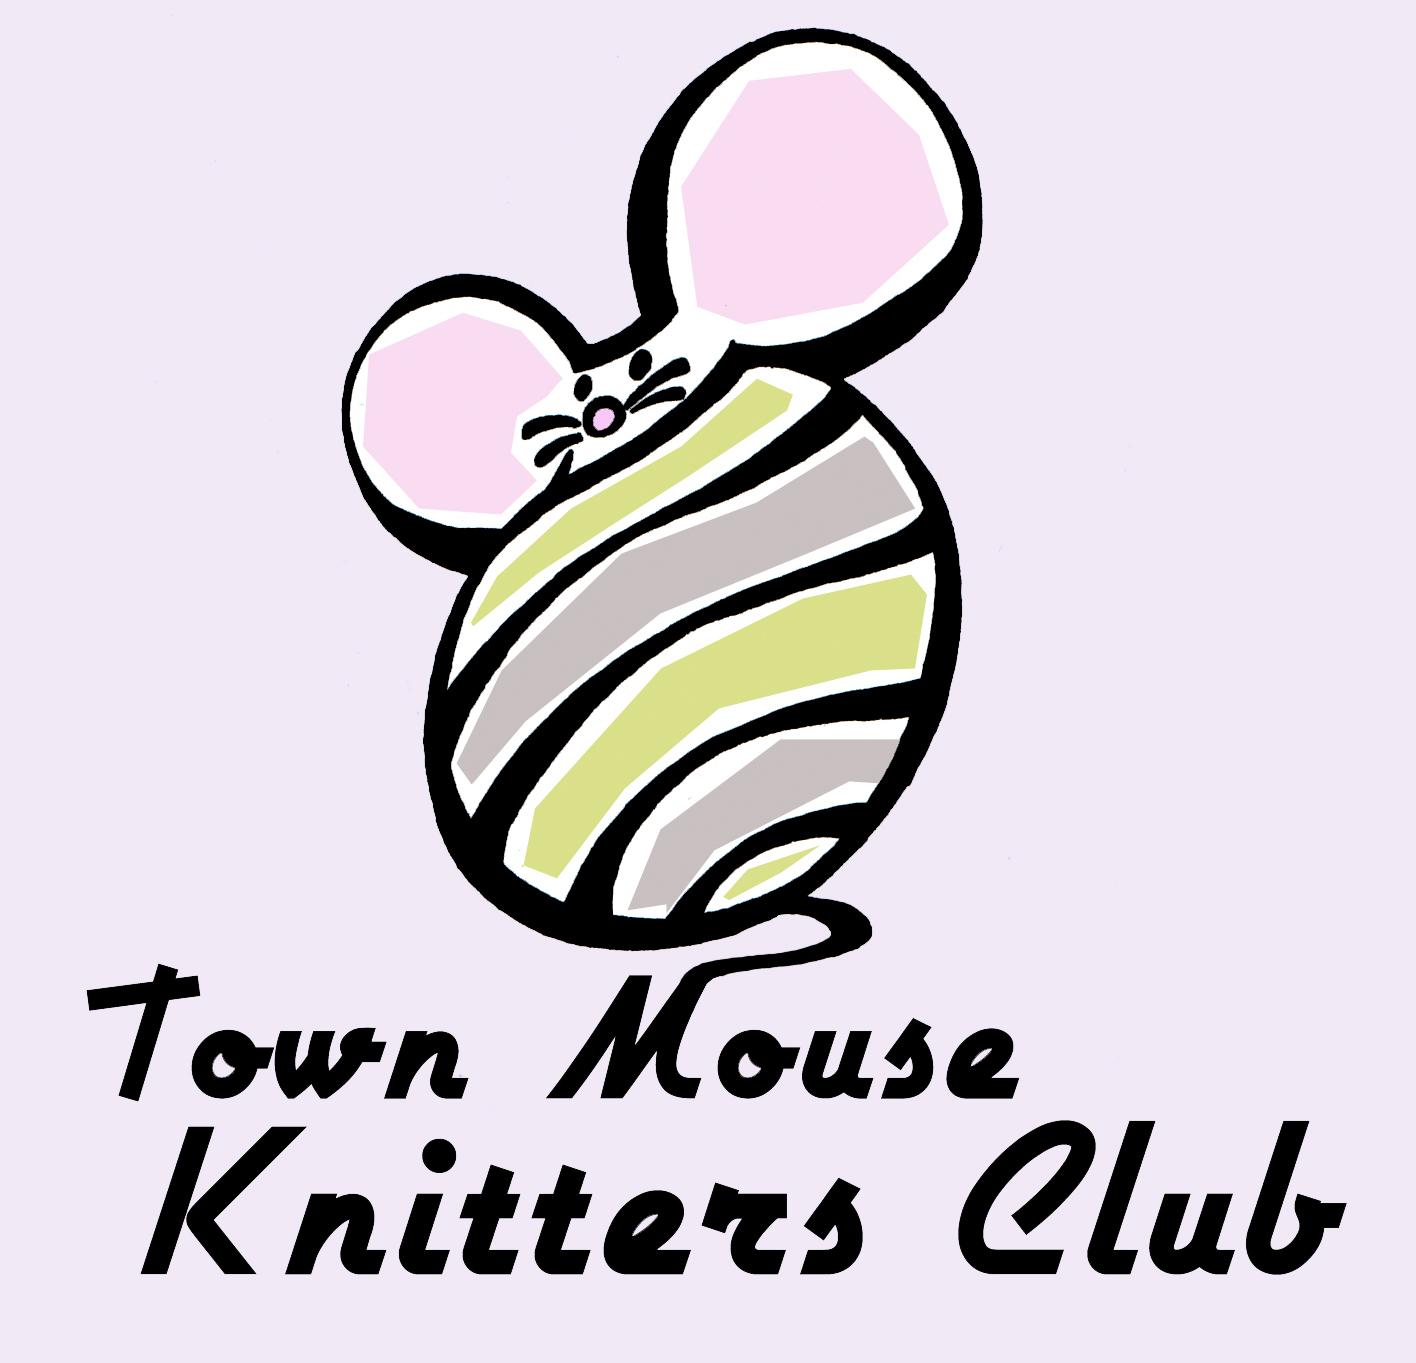 Knitting Club Logo : Islandboy illustration edinburgh knitting club logo